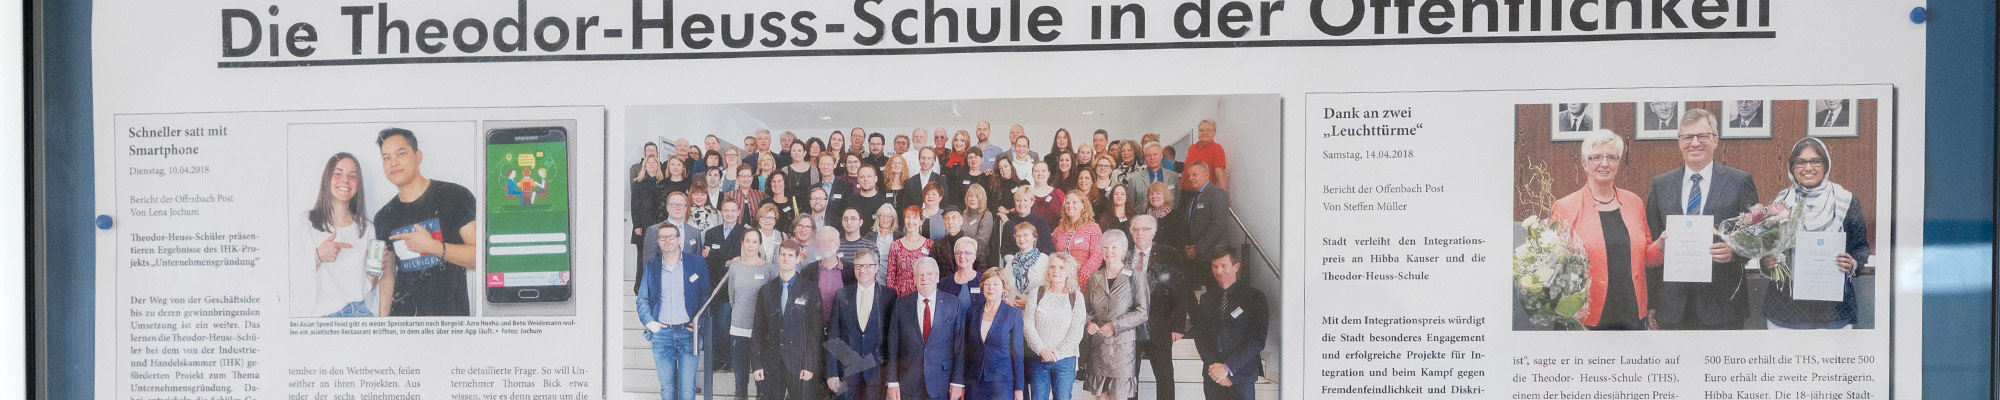 Theodor-Heuss-Schule Offenbach